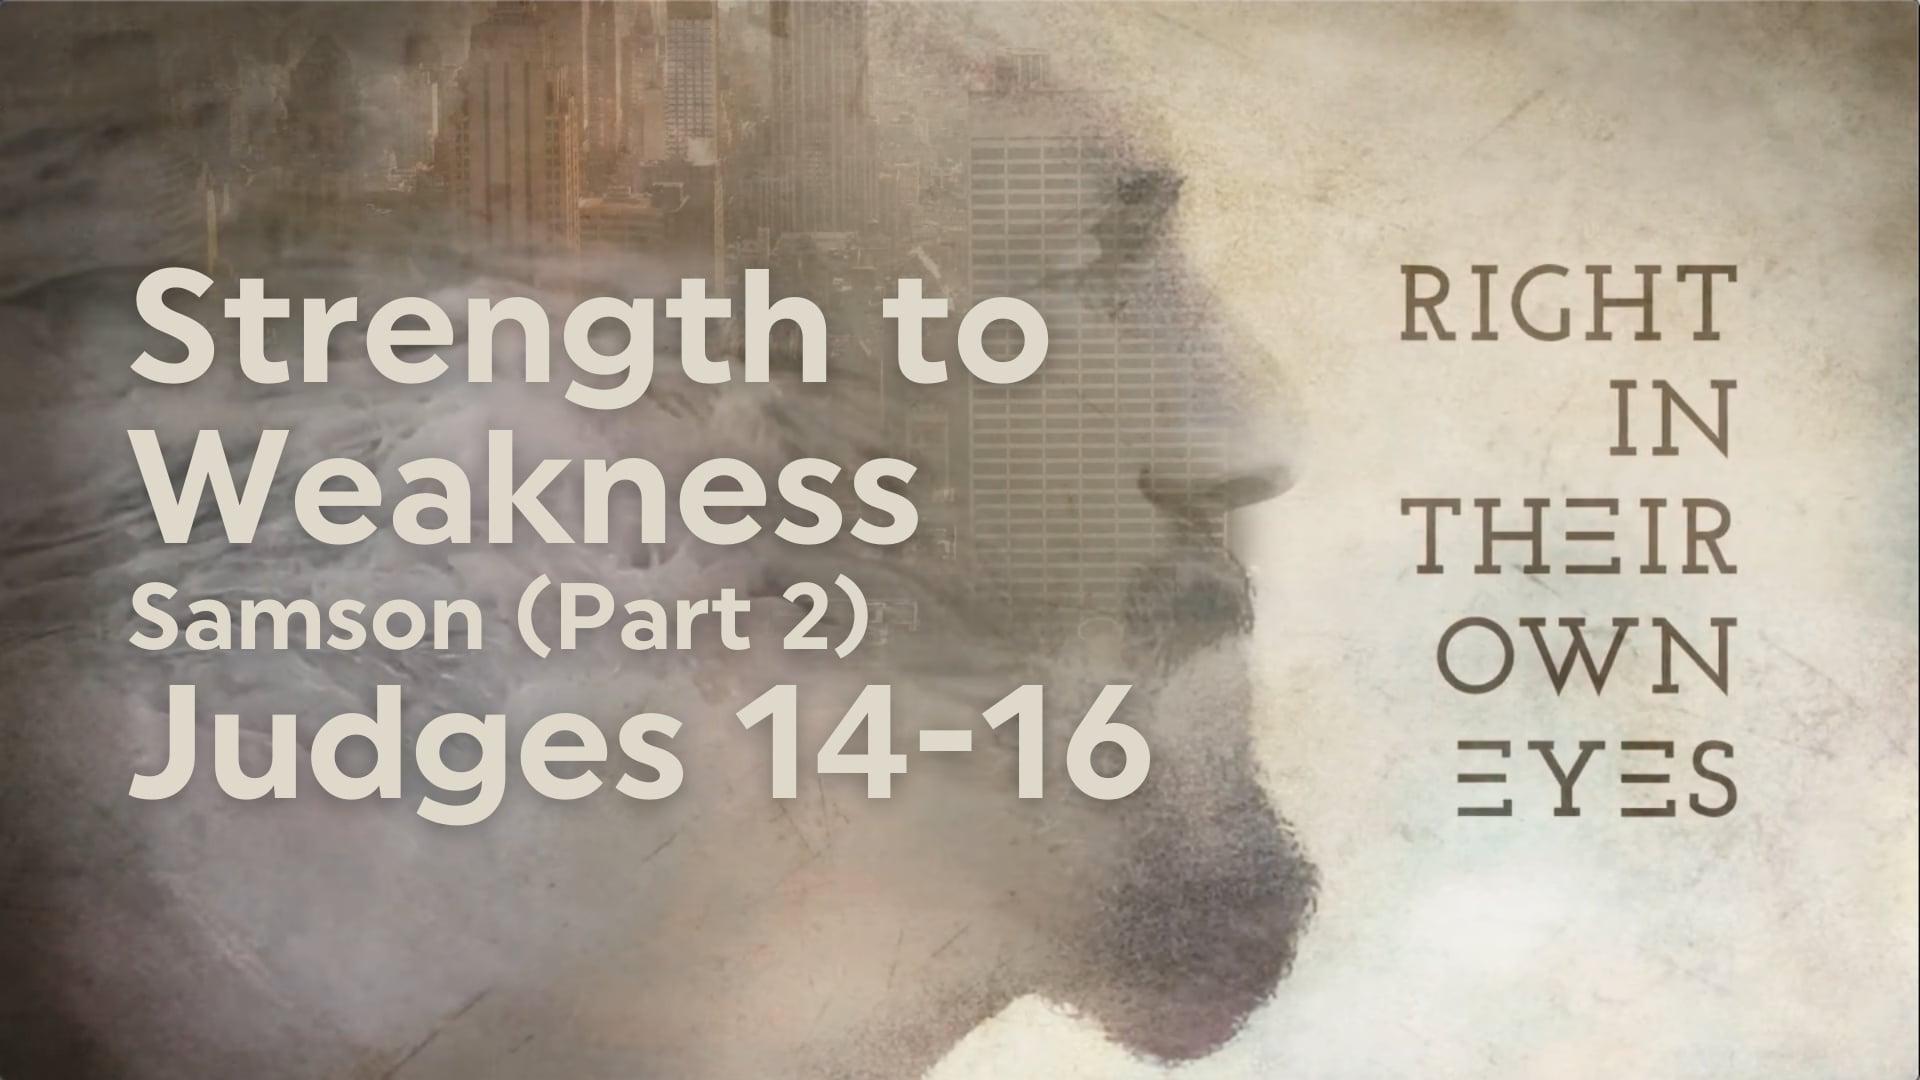 Strength to Weakness - Samson (Part 2) - November 22, 2020